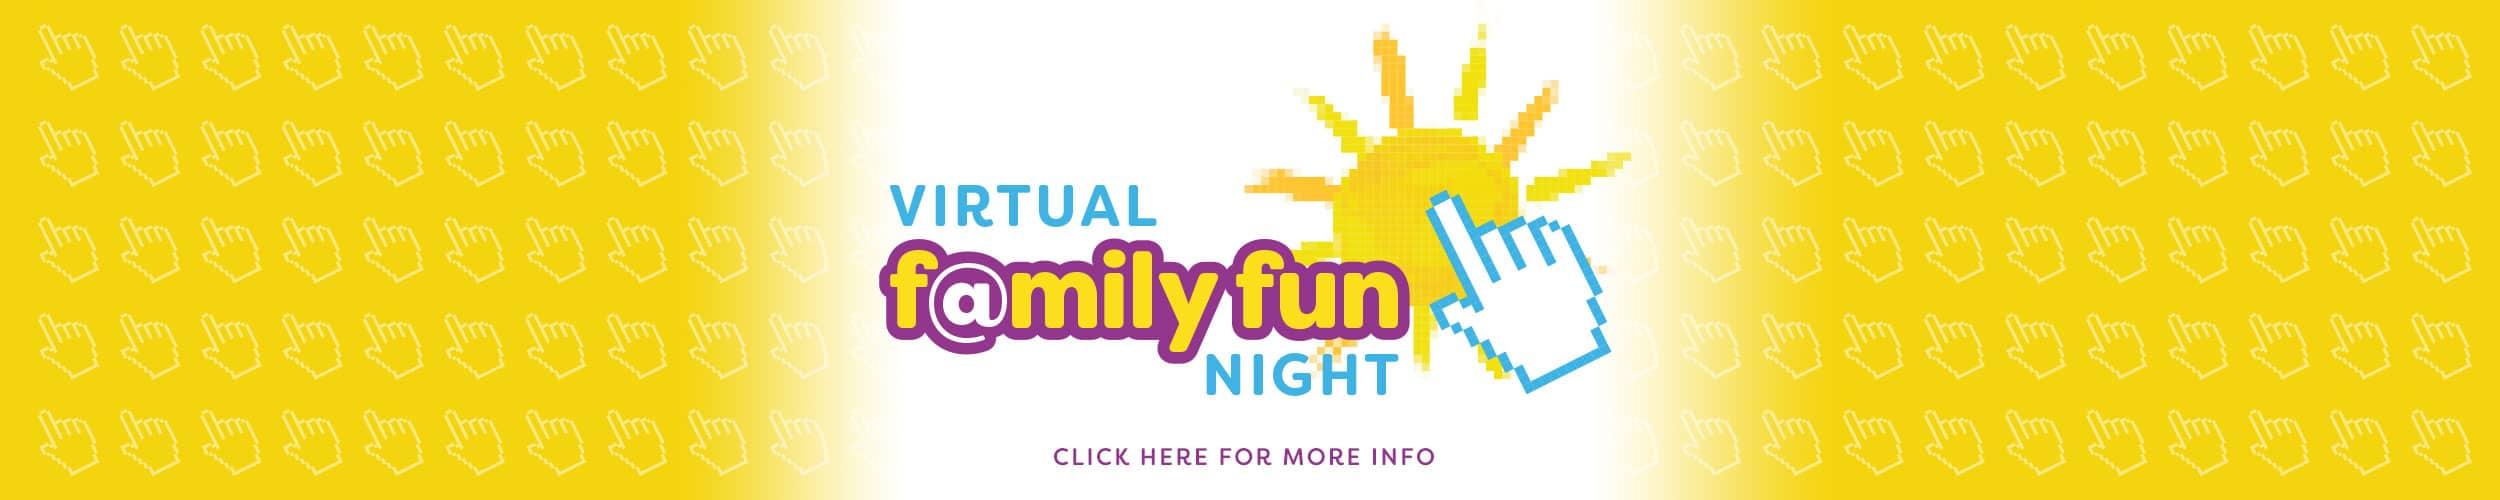 Virtual-Family-Fun-Night-slider